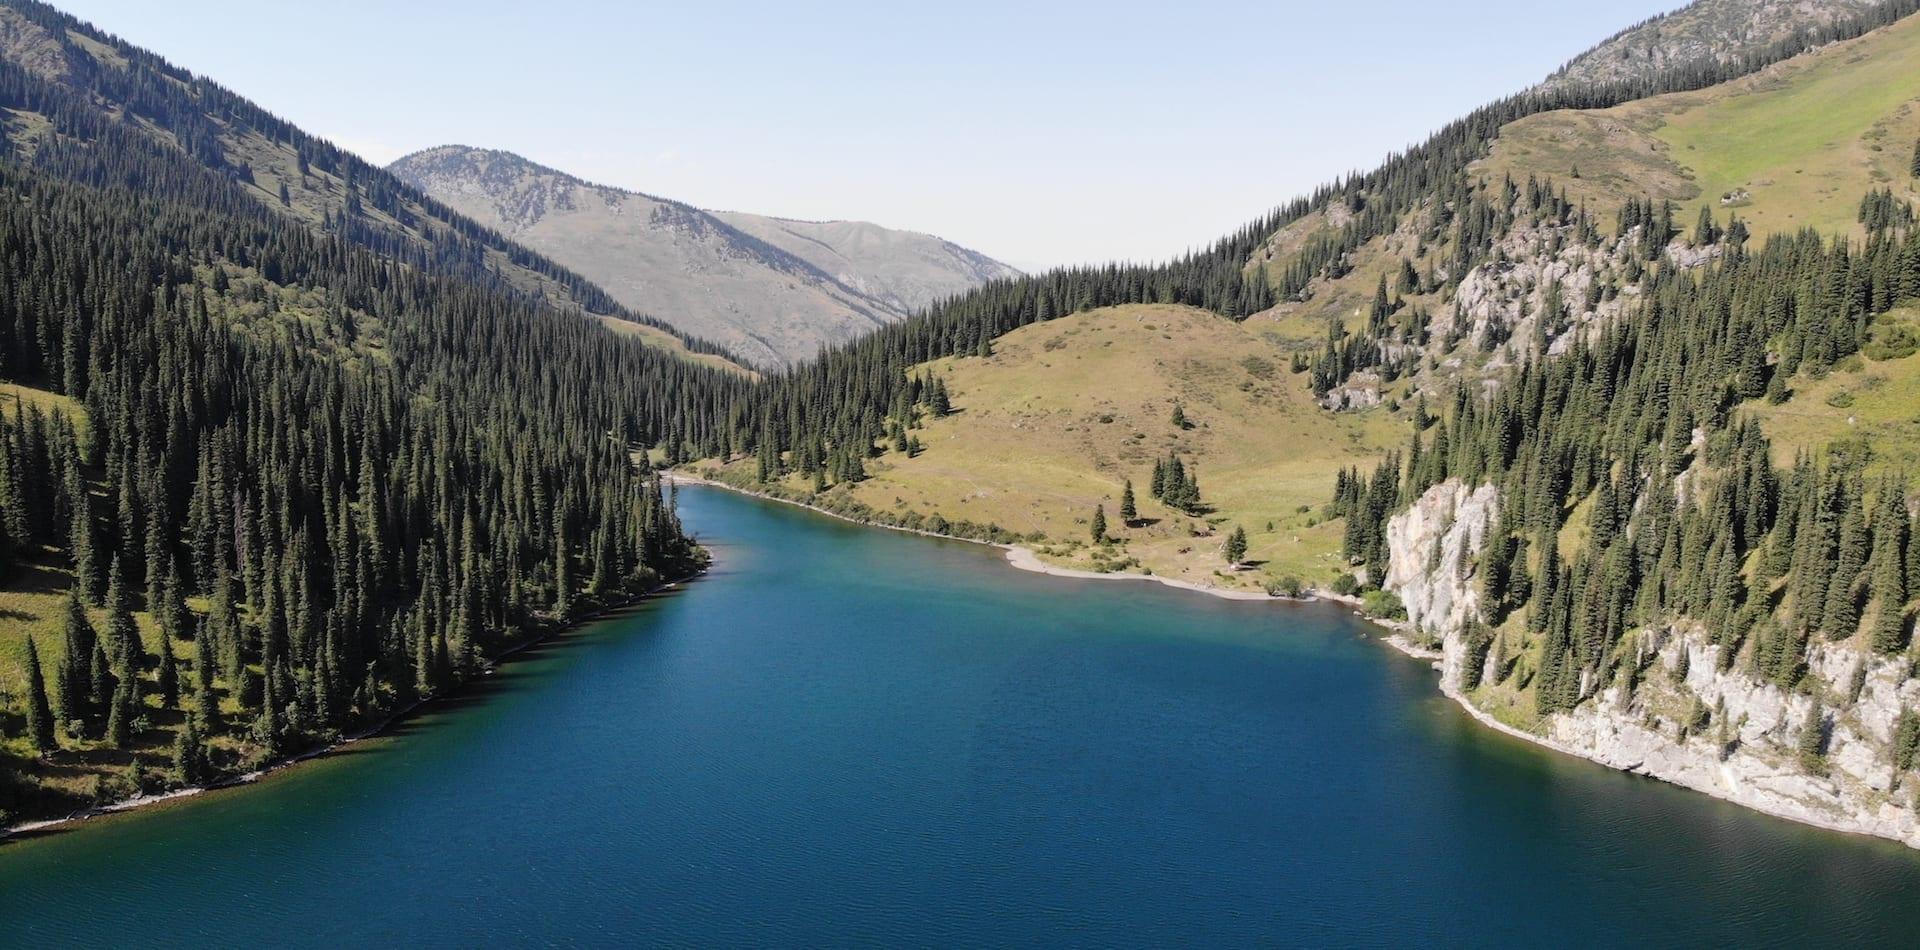 Kazakhstan's natural beauty